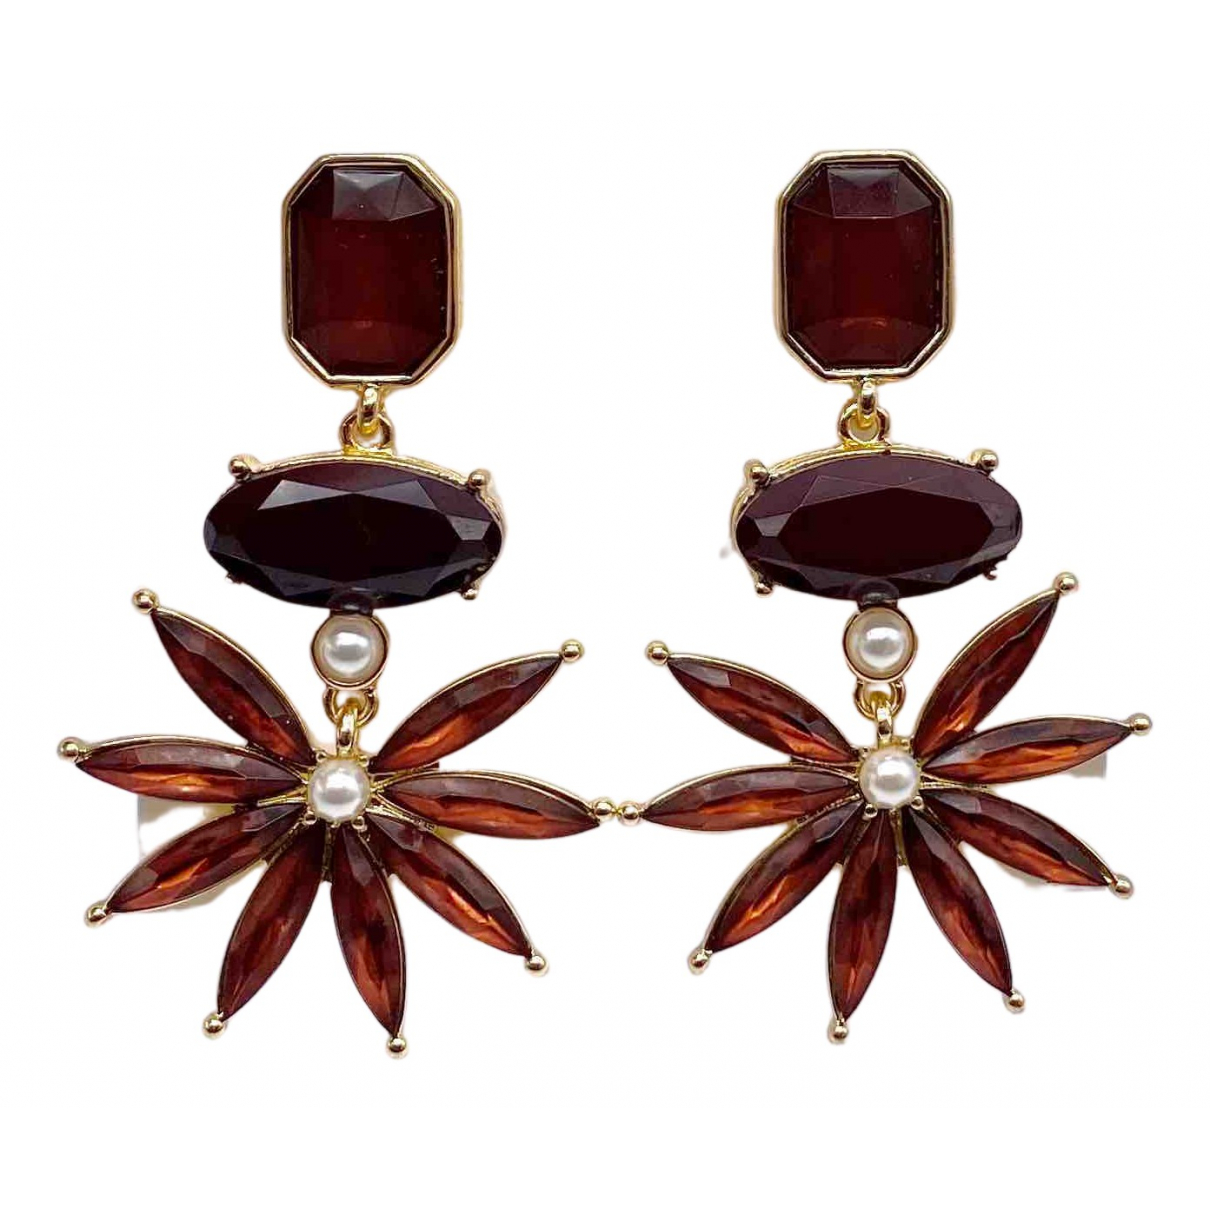 Non Signé / Unsigned Motifs Floraux Gold Metal Earrings for Women N